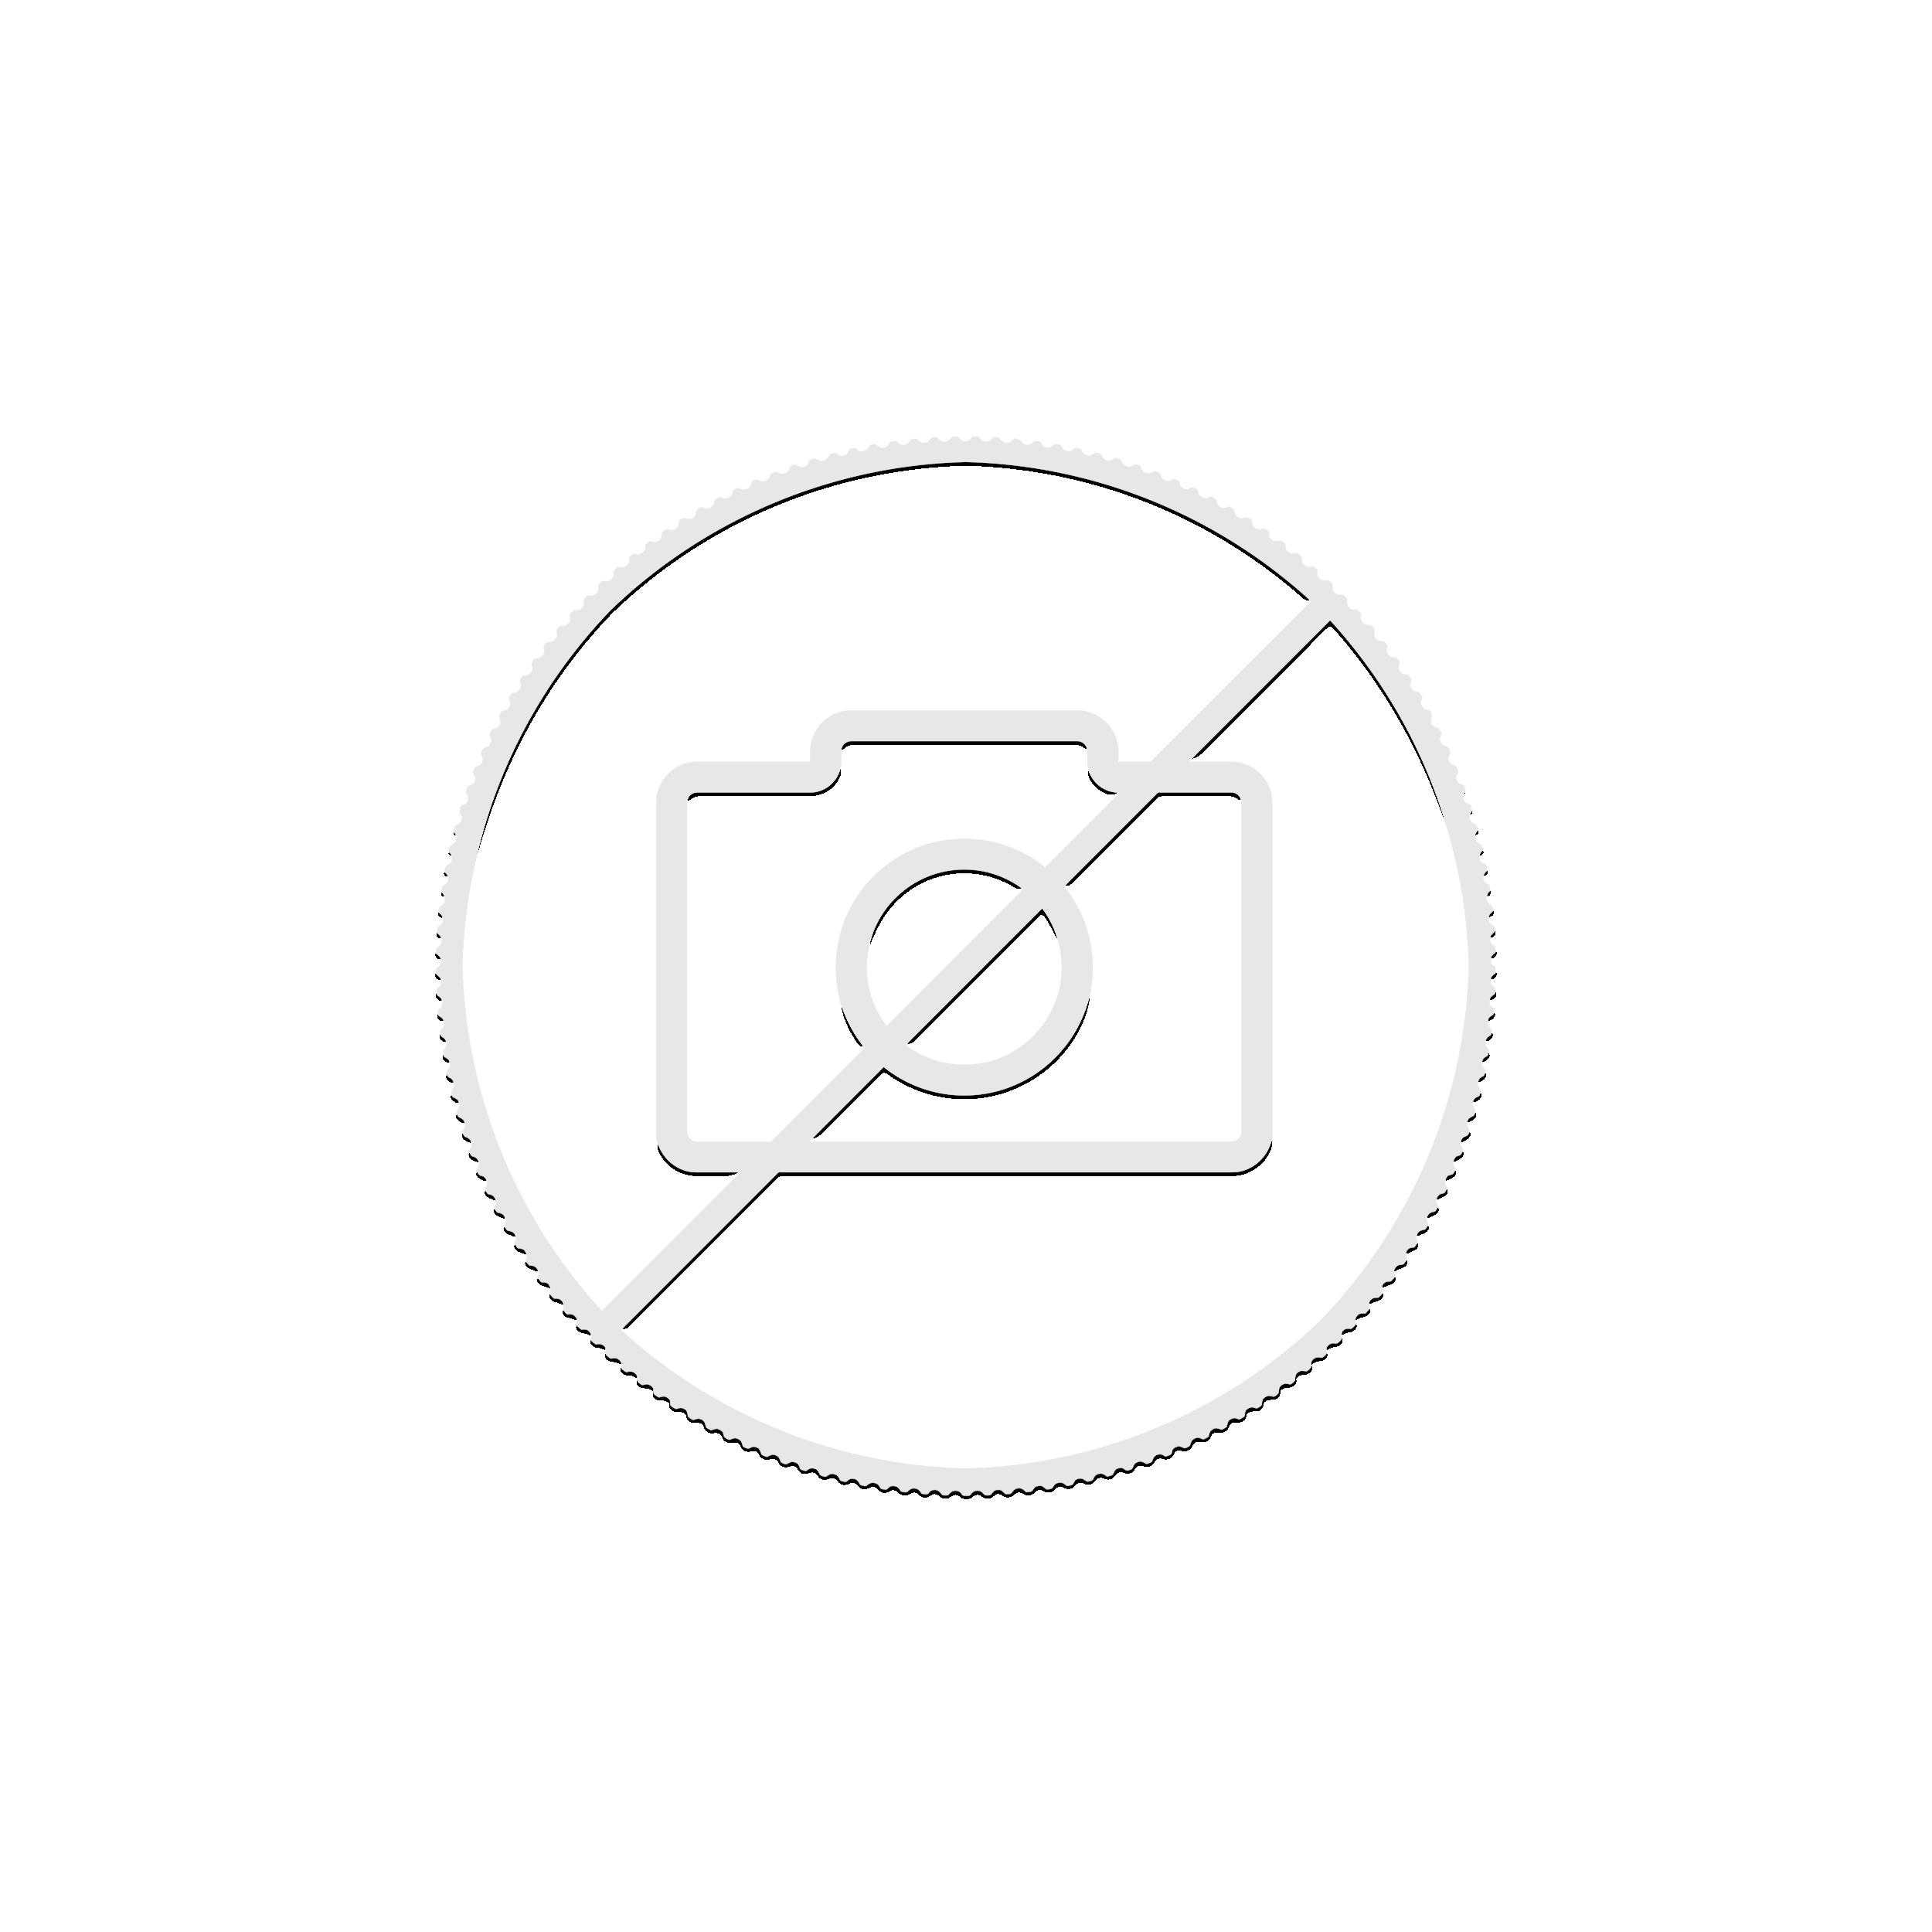 2 troy ounce zilveren munt portret Vincent van Gogh - Francs Chad 2021